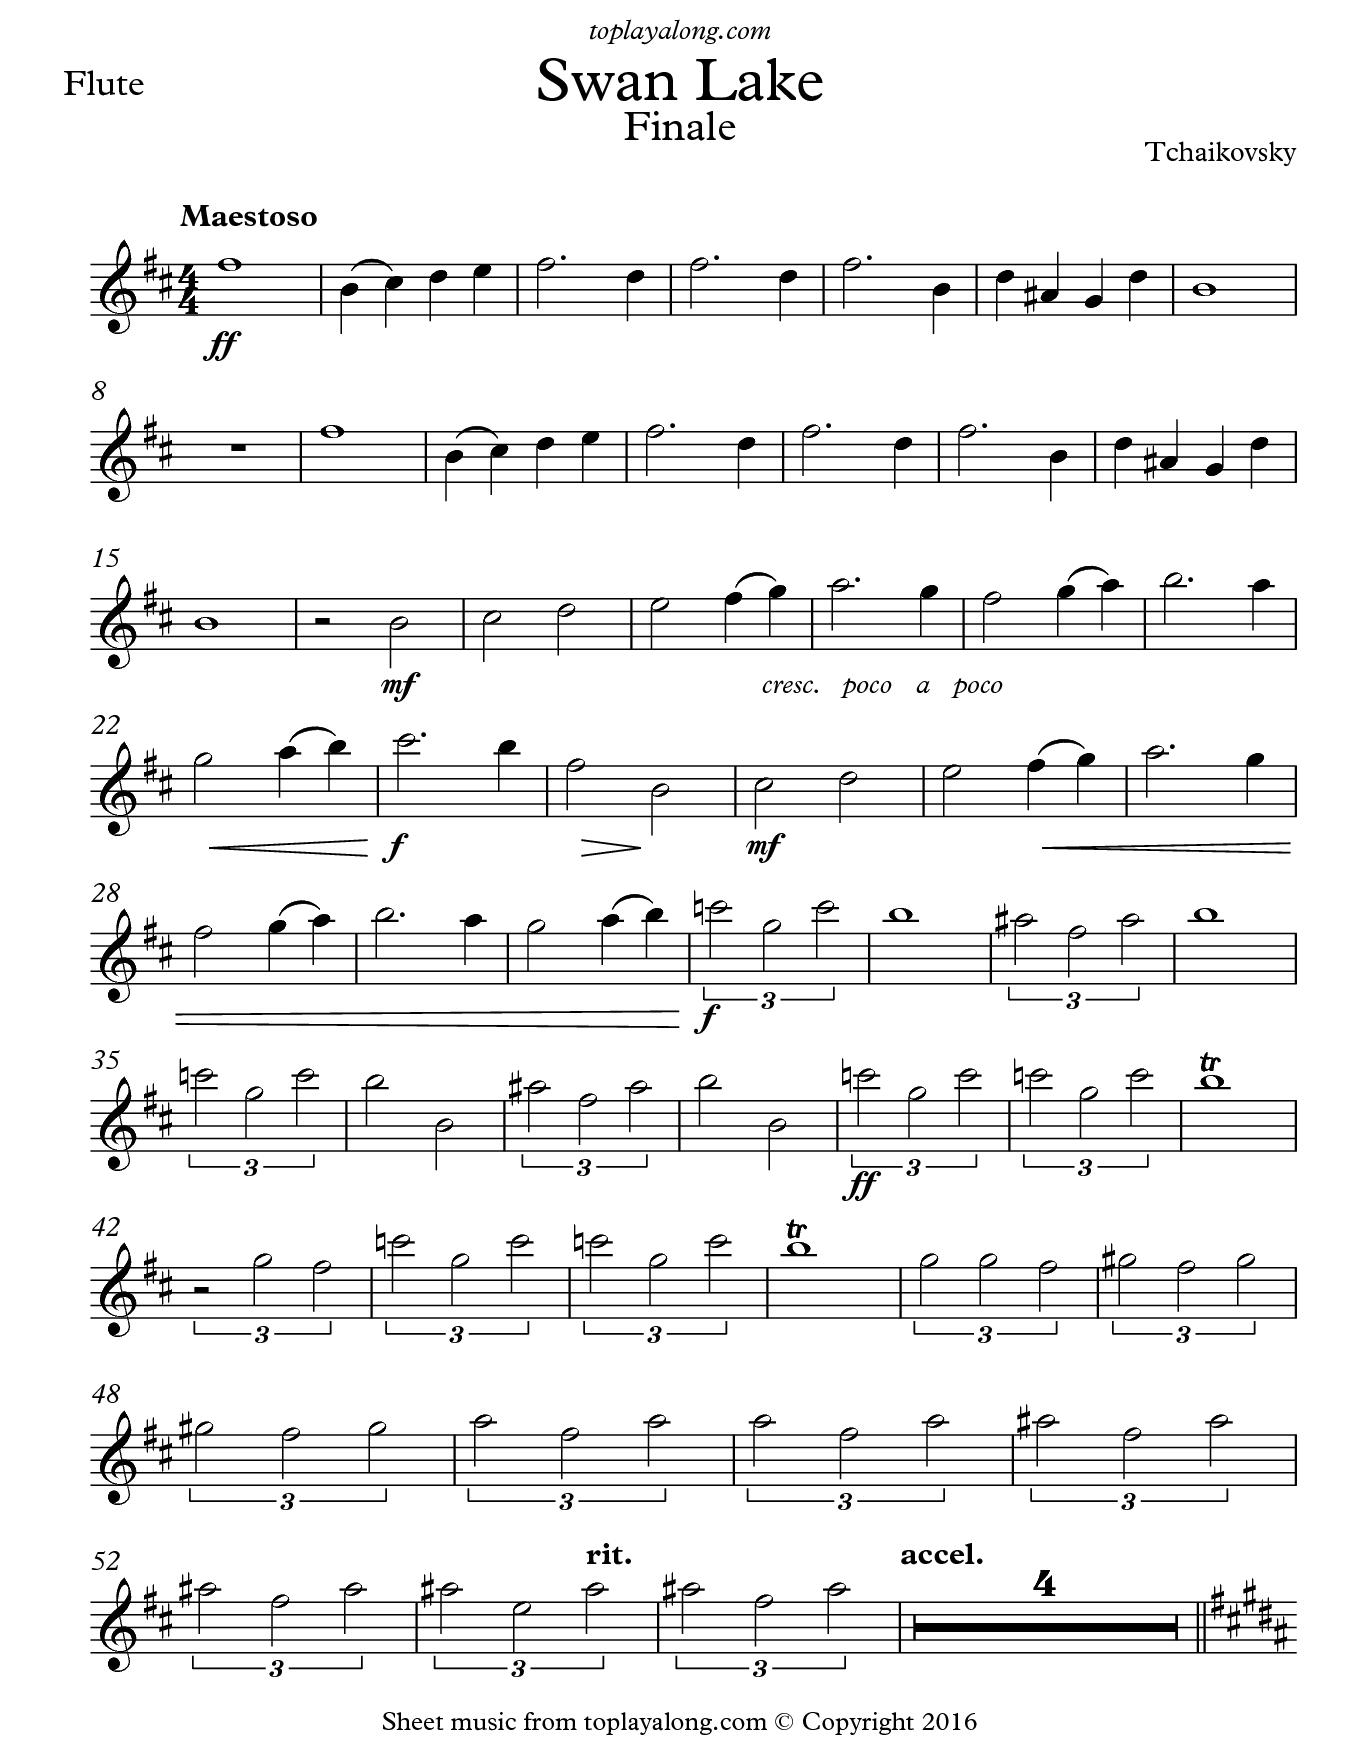 Free Flute Sheet Music For Swan Lake Finaletchaikovsky With - Free Printable Flute Sheet Music